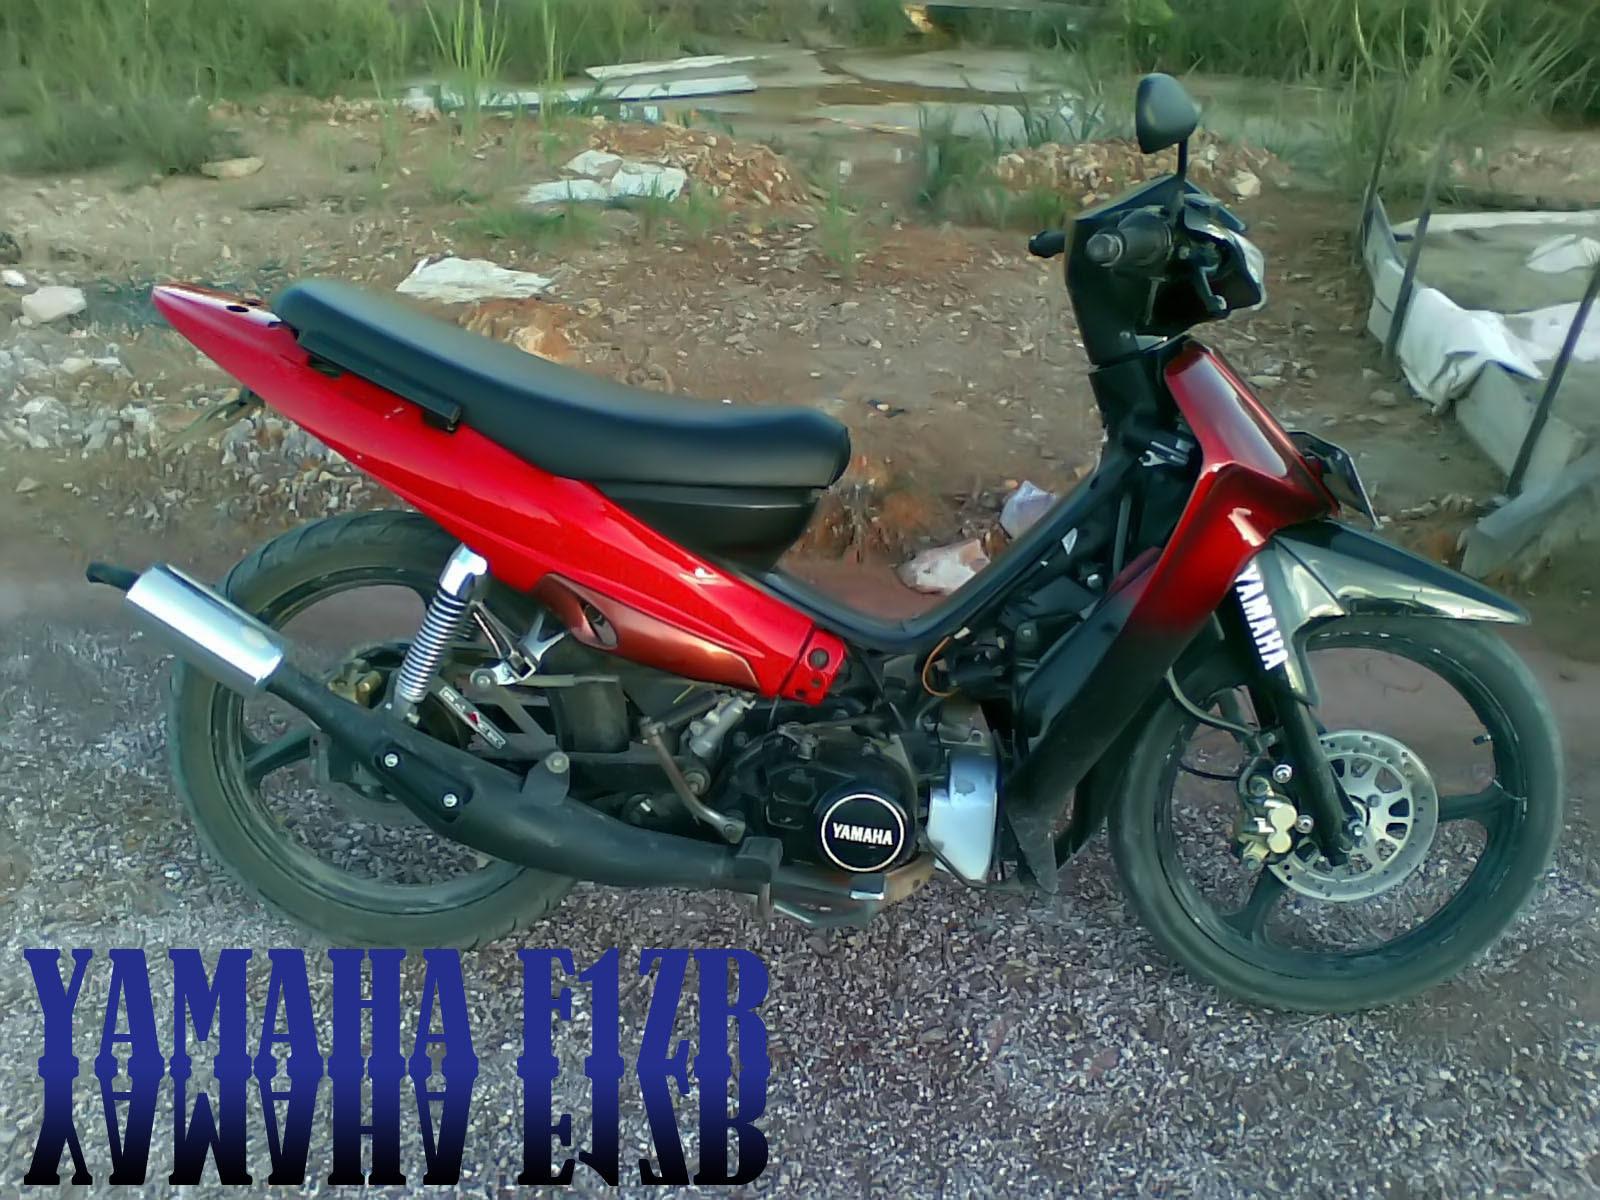 F1zr Untuk Medan Pegunungan Yamaha F1zr Modified To Fit The